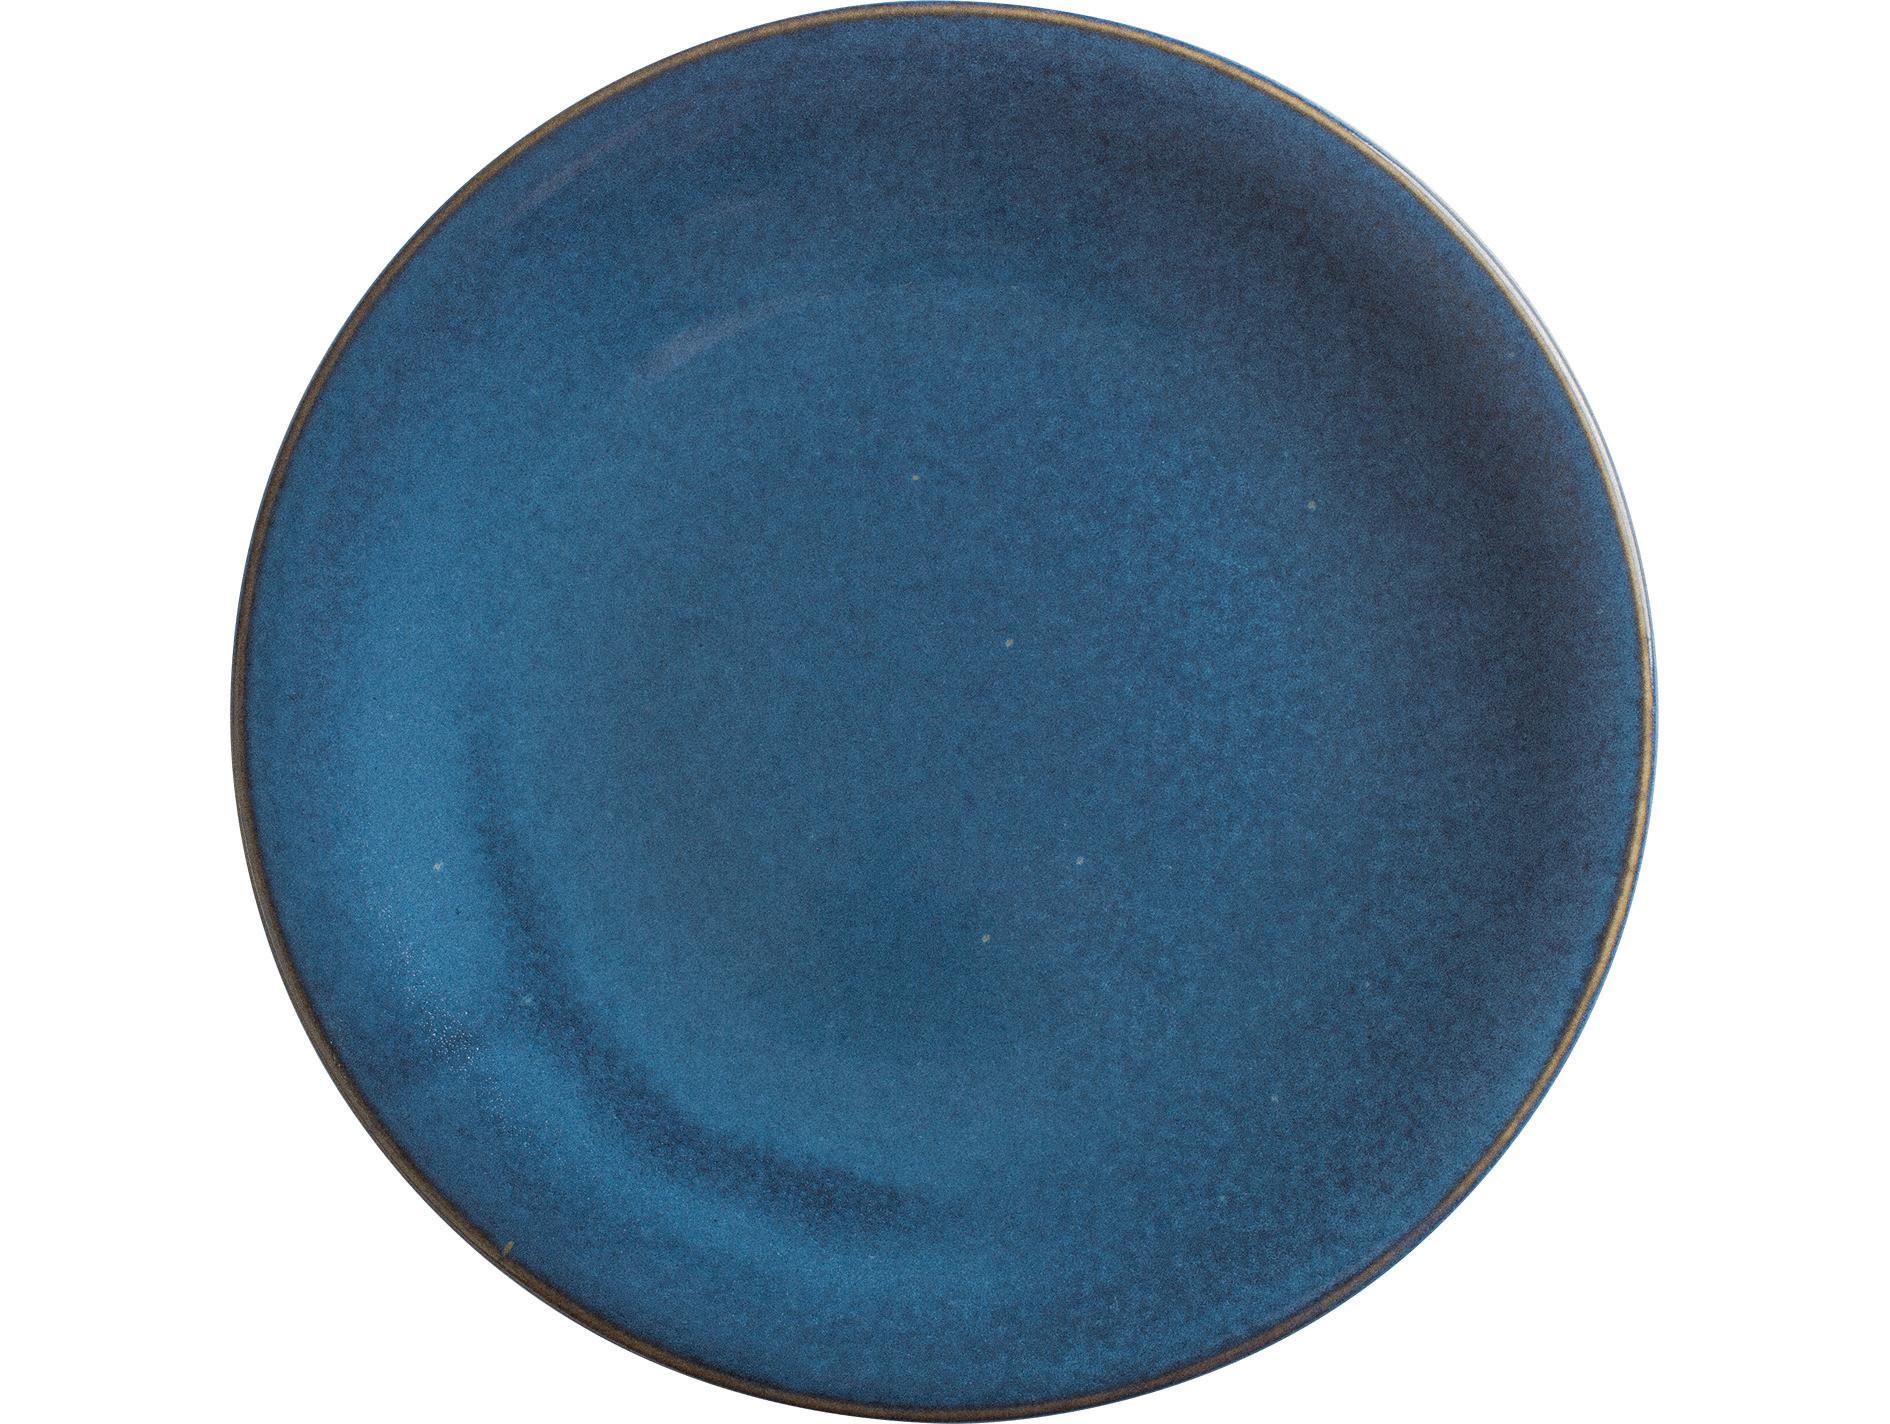 Homestyle, Essteller ø 257 mm atlantic blue